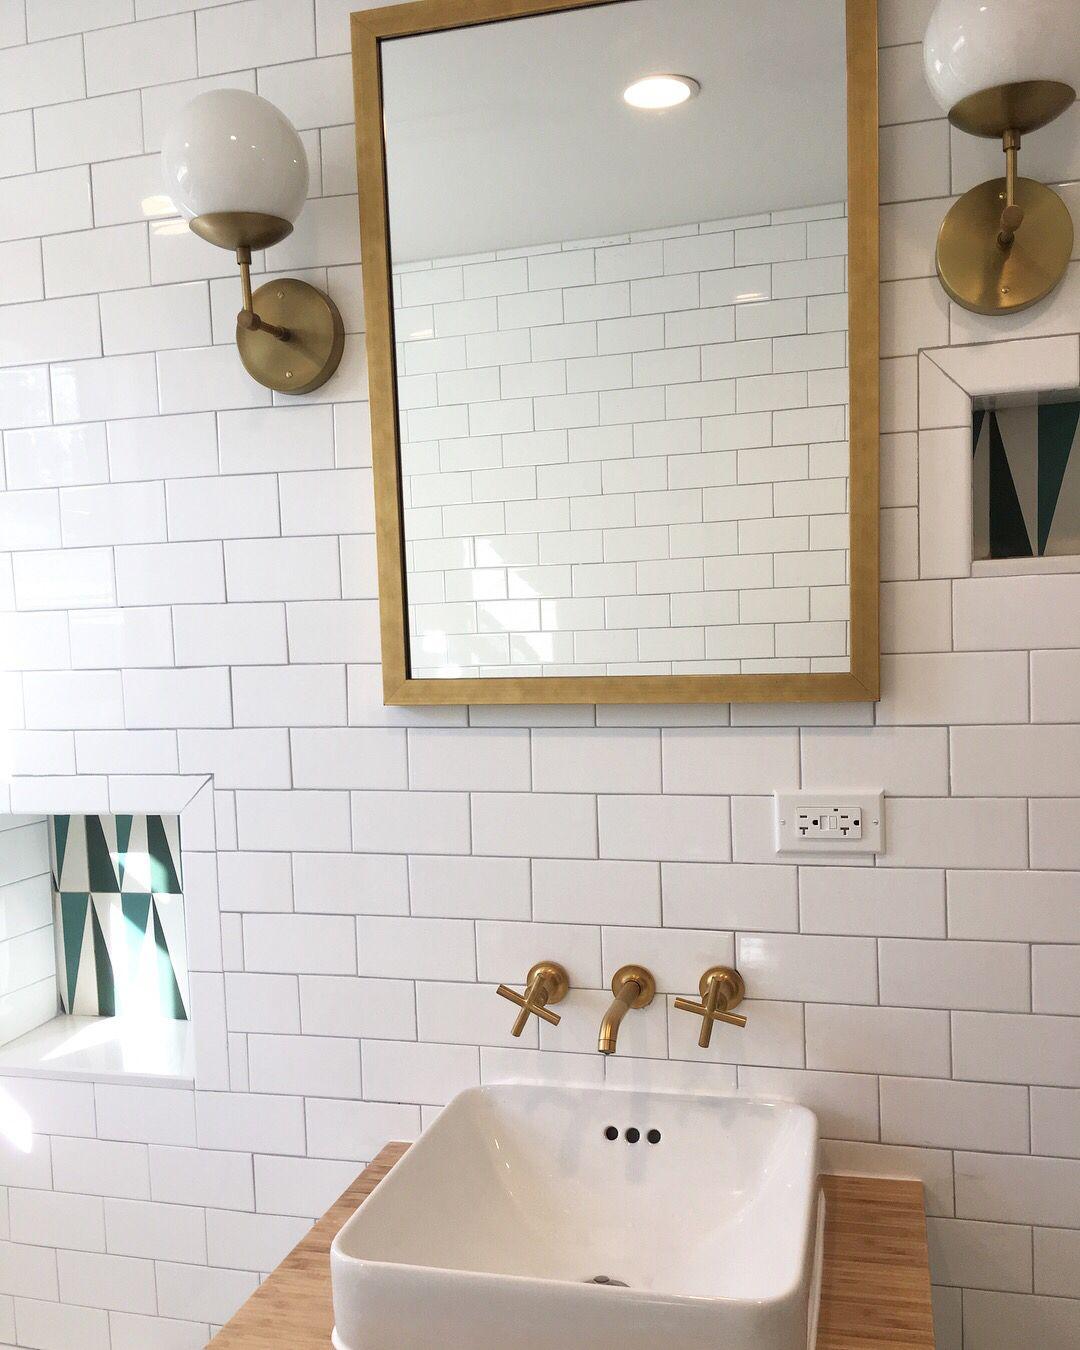 Before & After: A DIY Bathroom Disaster Made Good Again | Bathtubs ...